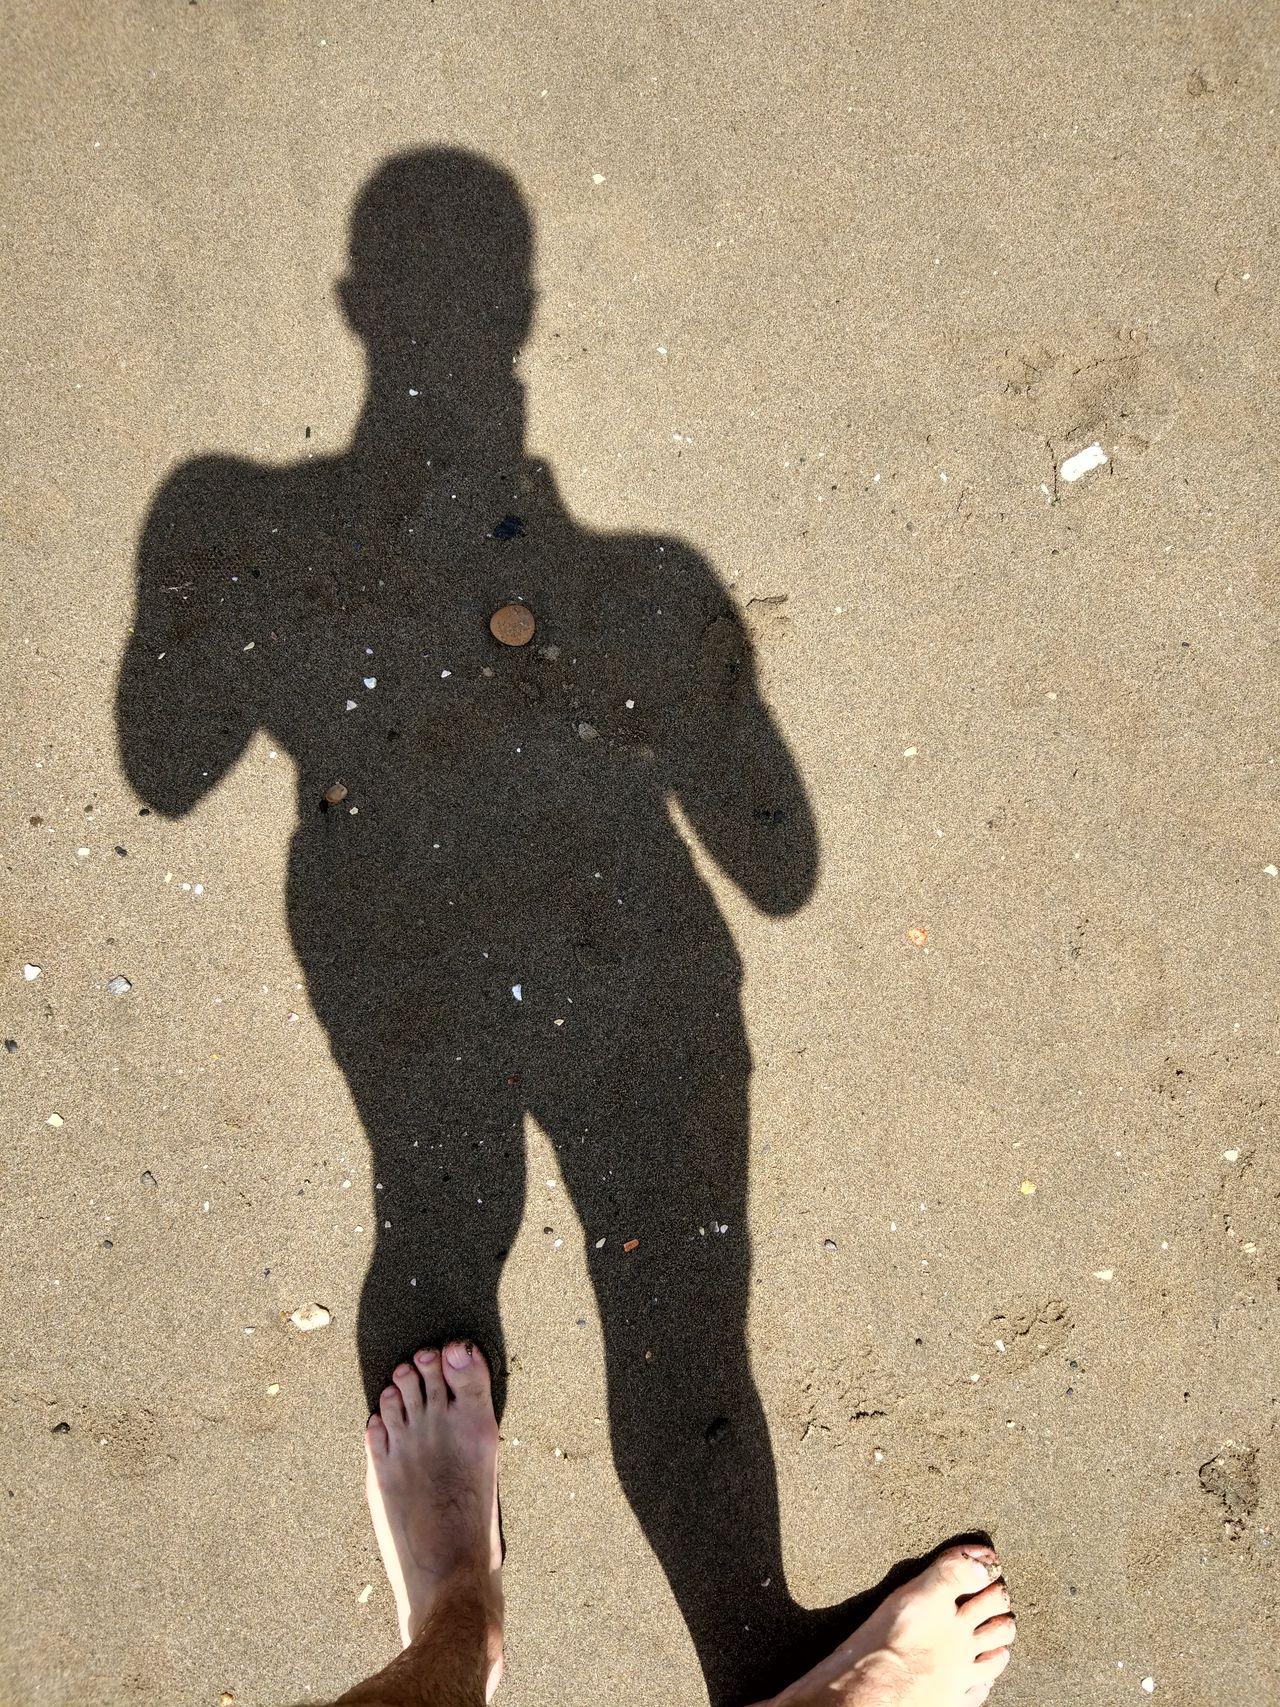 Benalmádena Beach Sand Shadow Sun Sunlight High Angle View Focus On Shadow Person